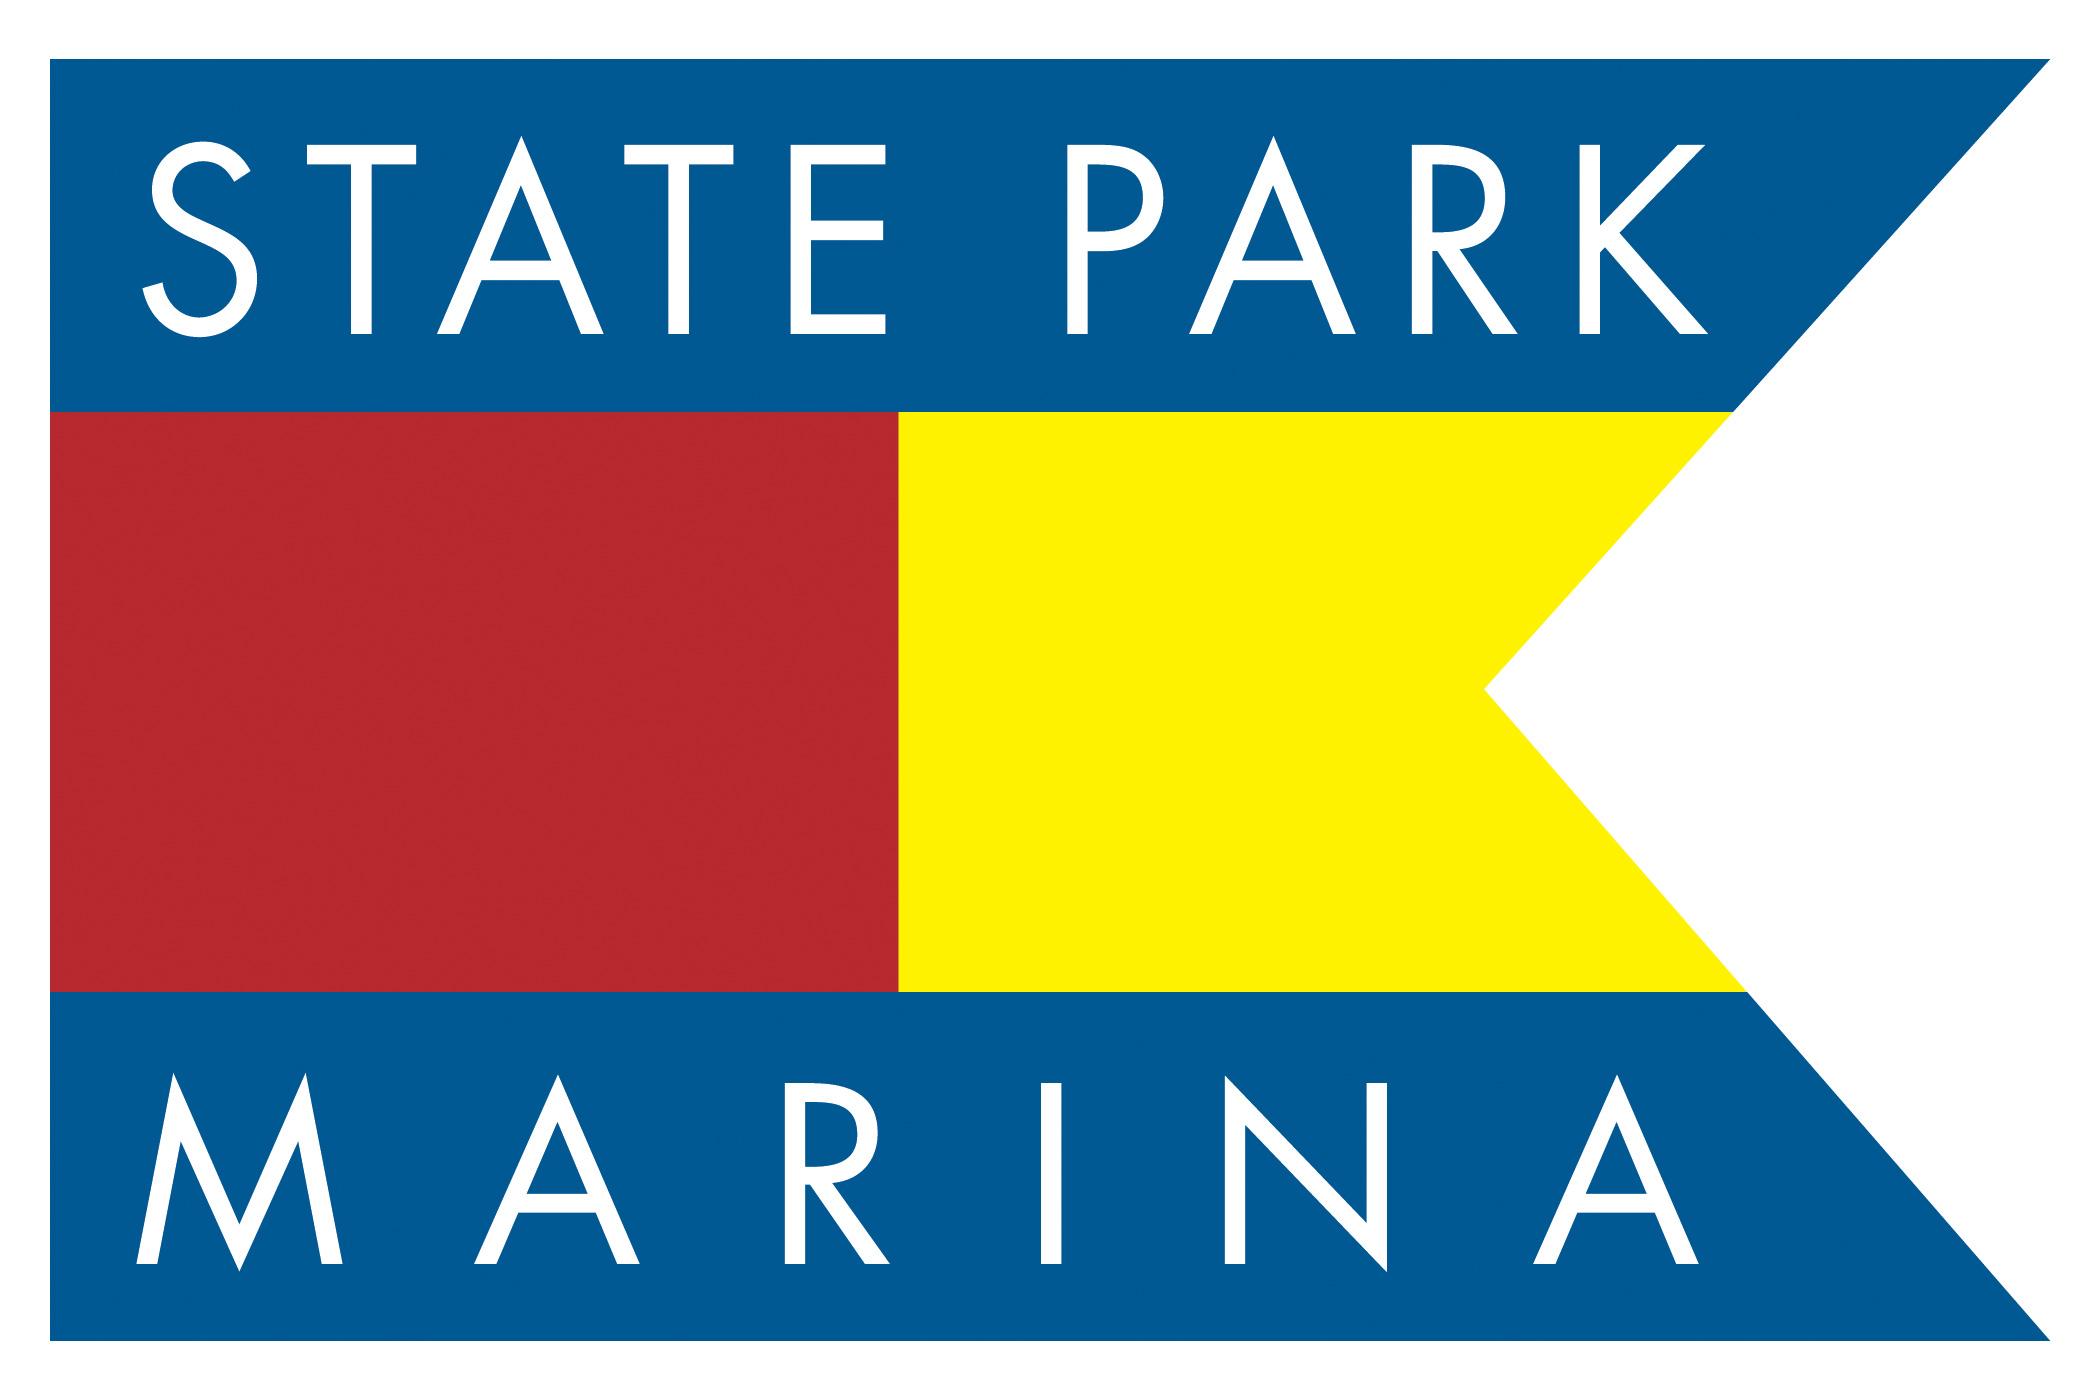 https://growthzonesitesprod.azureedge.net/wp-content/uploads/sites/969/2021/04/State_Park_Marina_High-Res-Logo.jpg